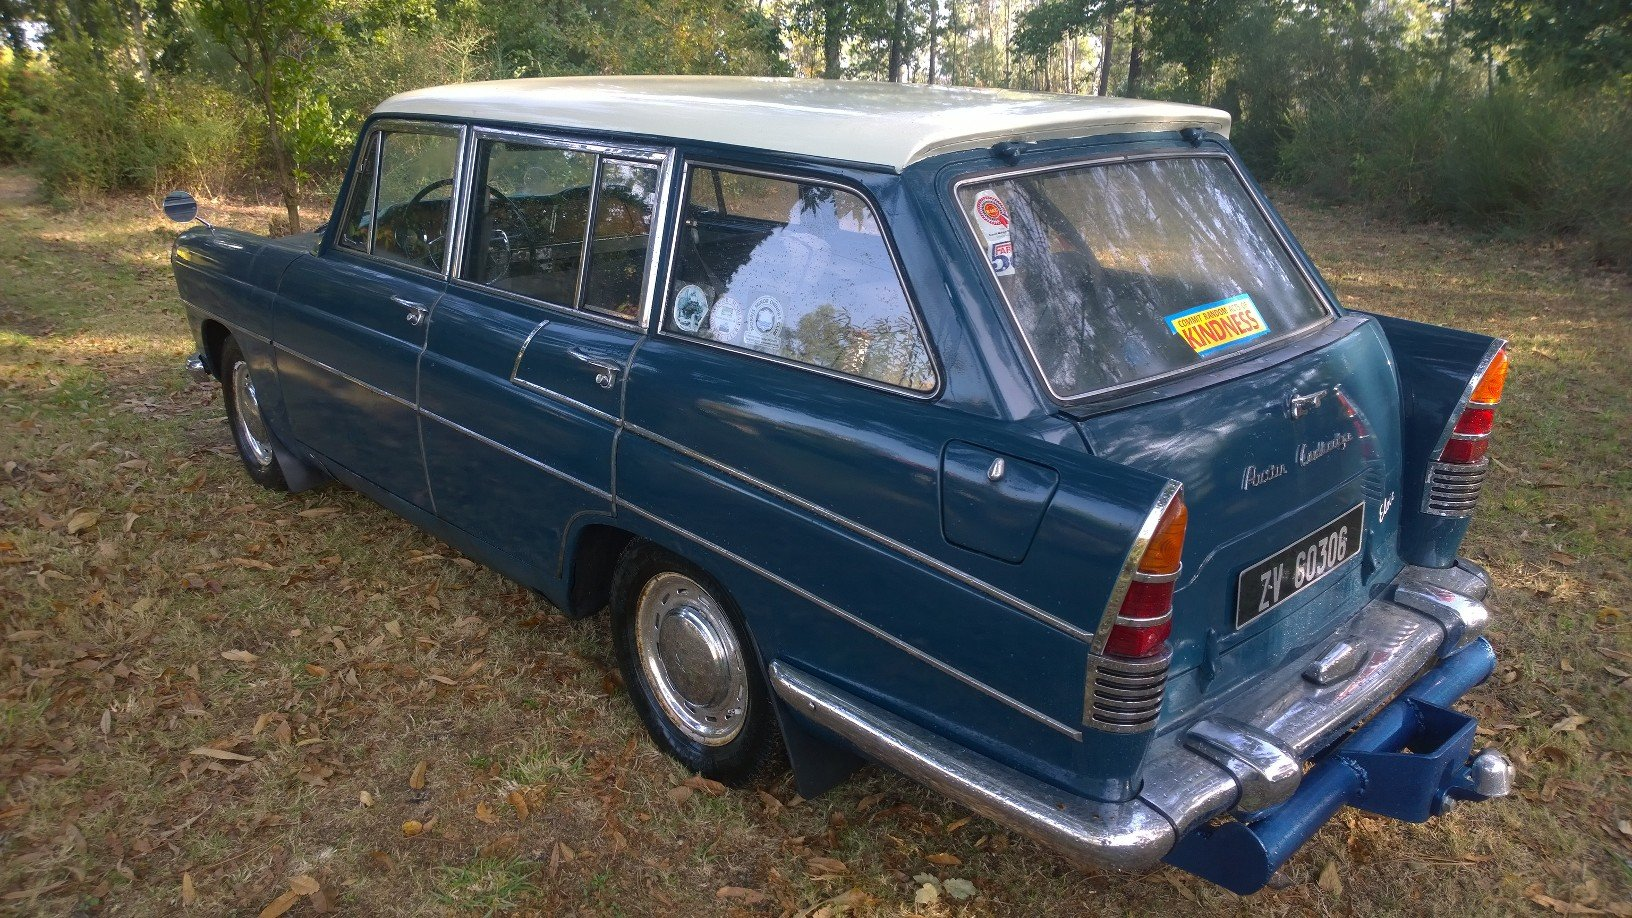 1968 Austin Cambridge Countryman Very rare car For Sale (picture 2 of 4)